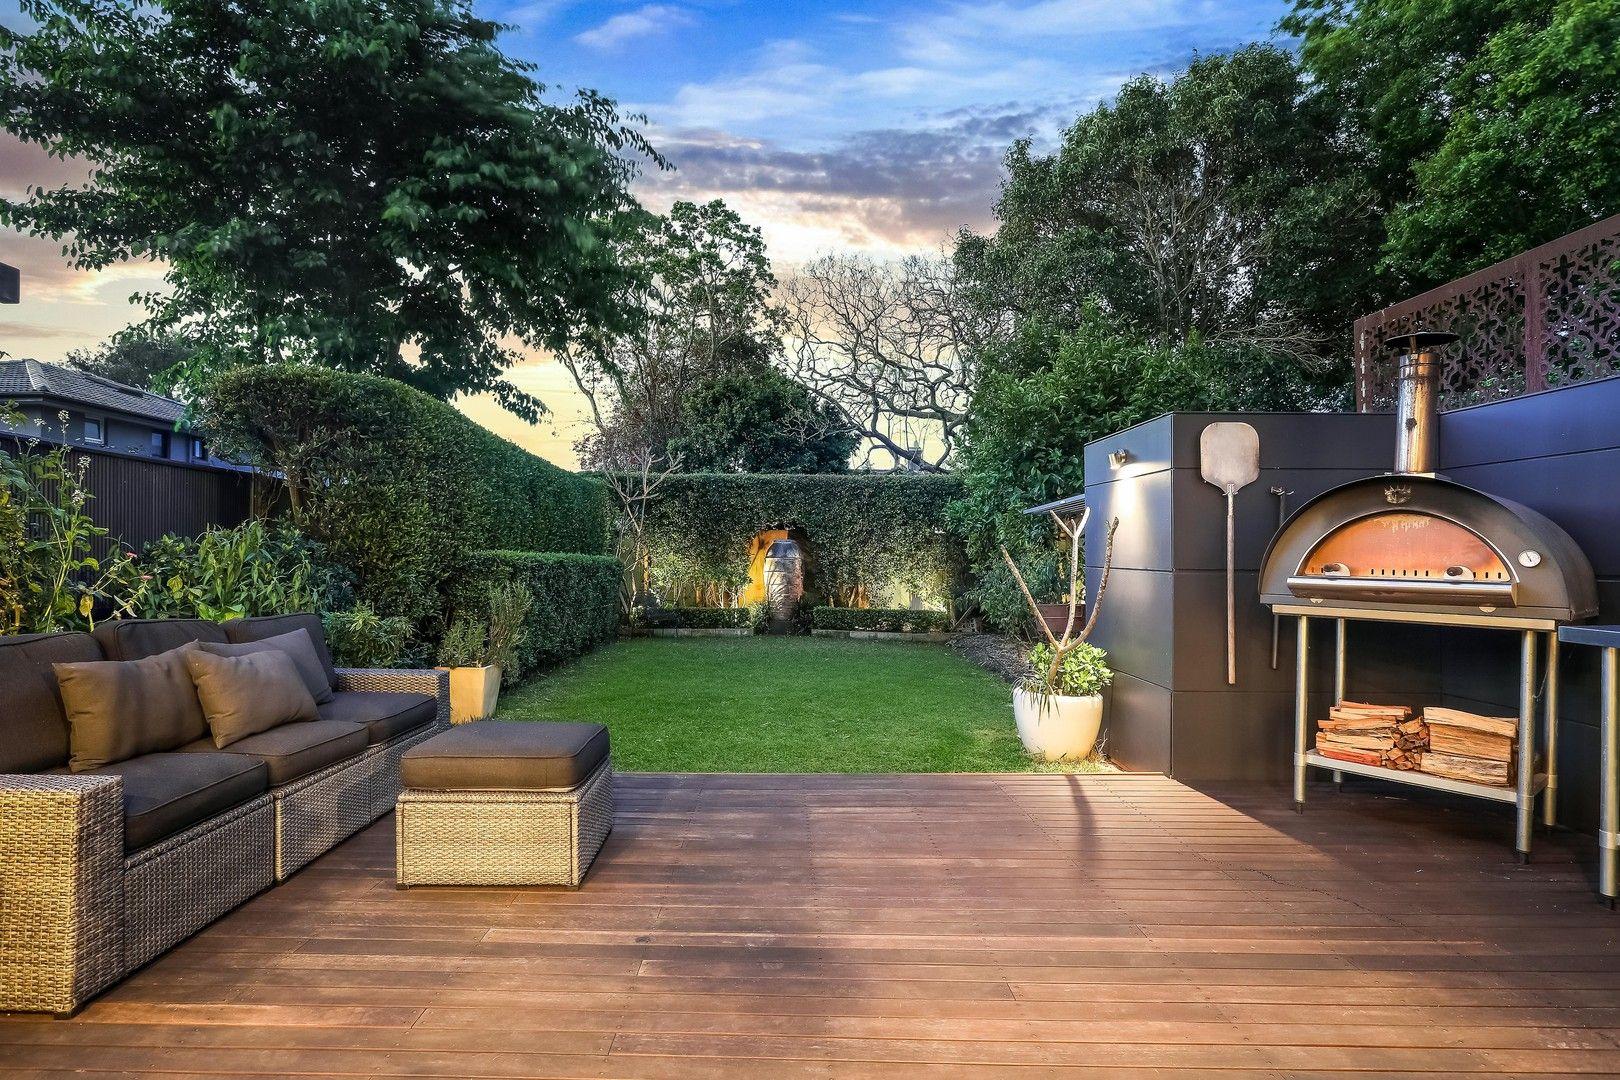 4 bedrooms House in 37 Marlborough Street LEICHHARDT NSW, 2040